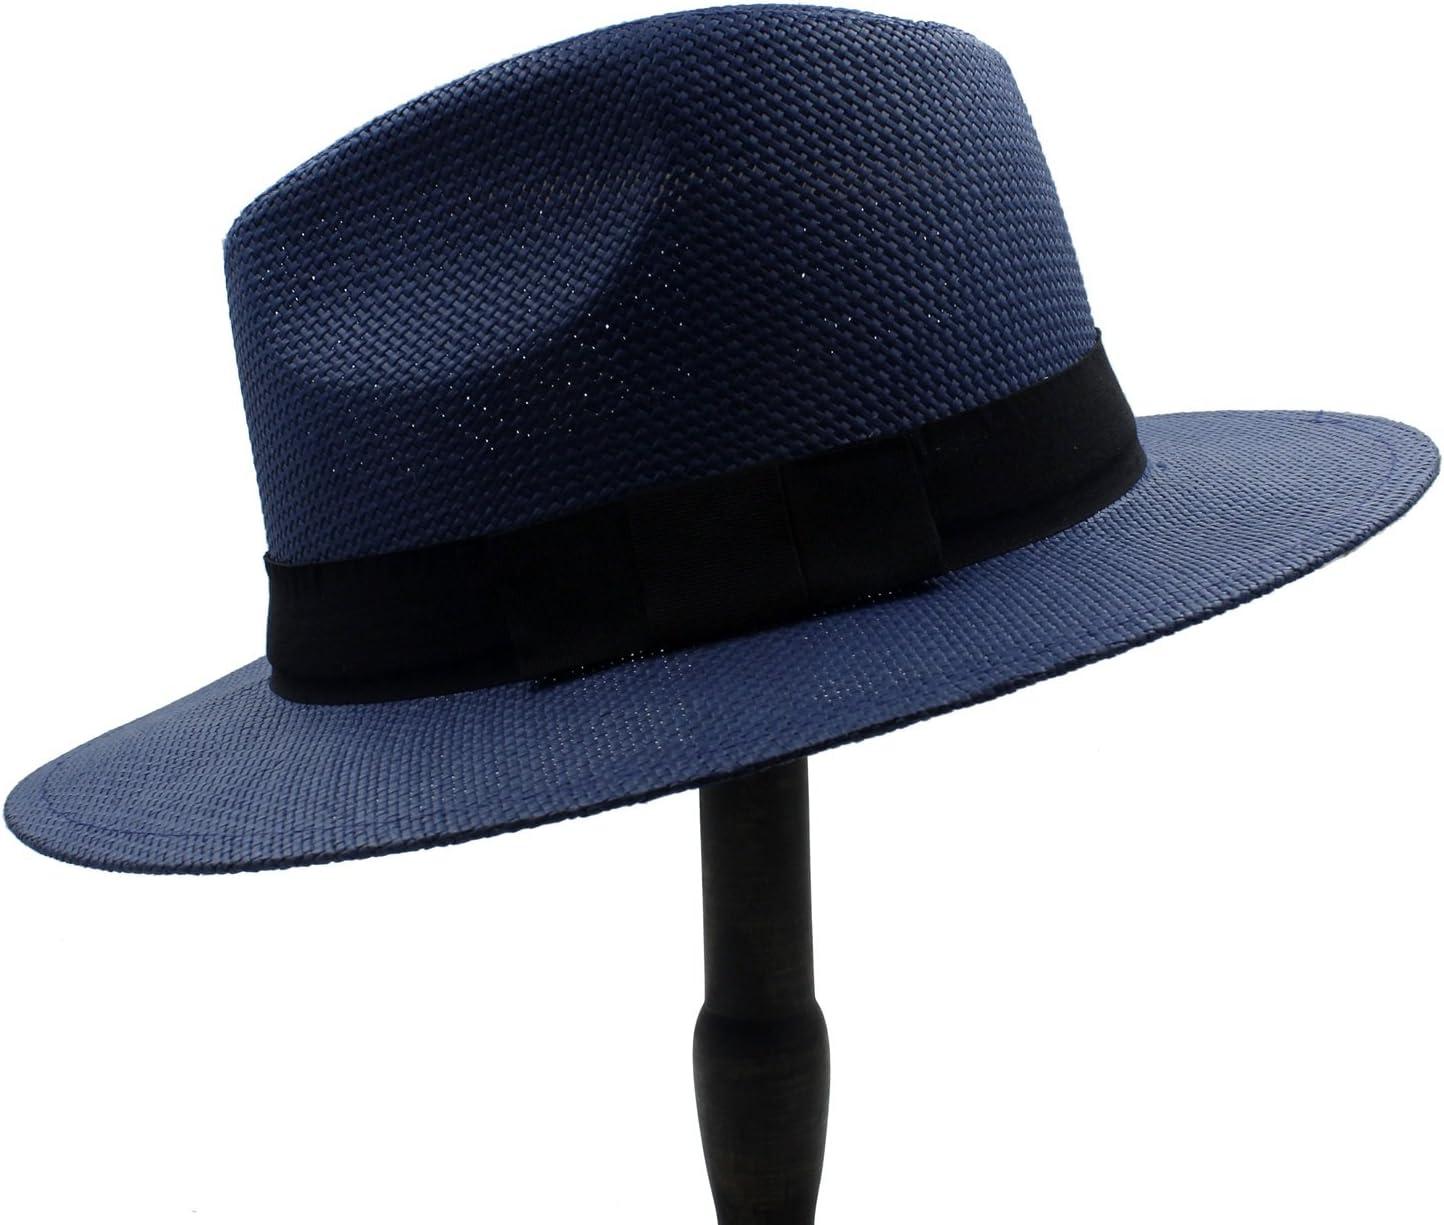 GR Summer Women Men Wide Brim Toquilla Straw Panama Sun Hat for Elegant Lady Gentleman Gangster Trilby Fedora Beach Dad Cap (Color : 2, Size : 56cm-59cm)